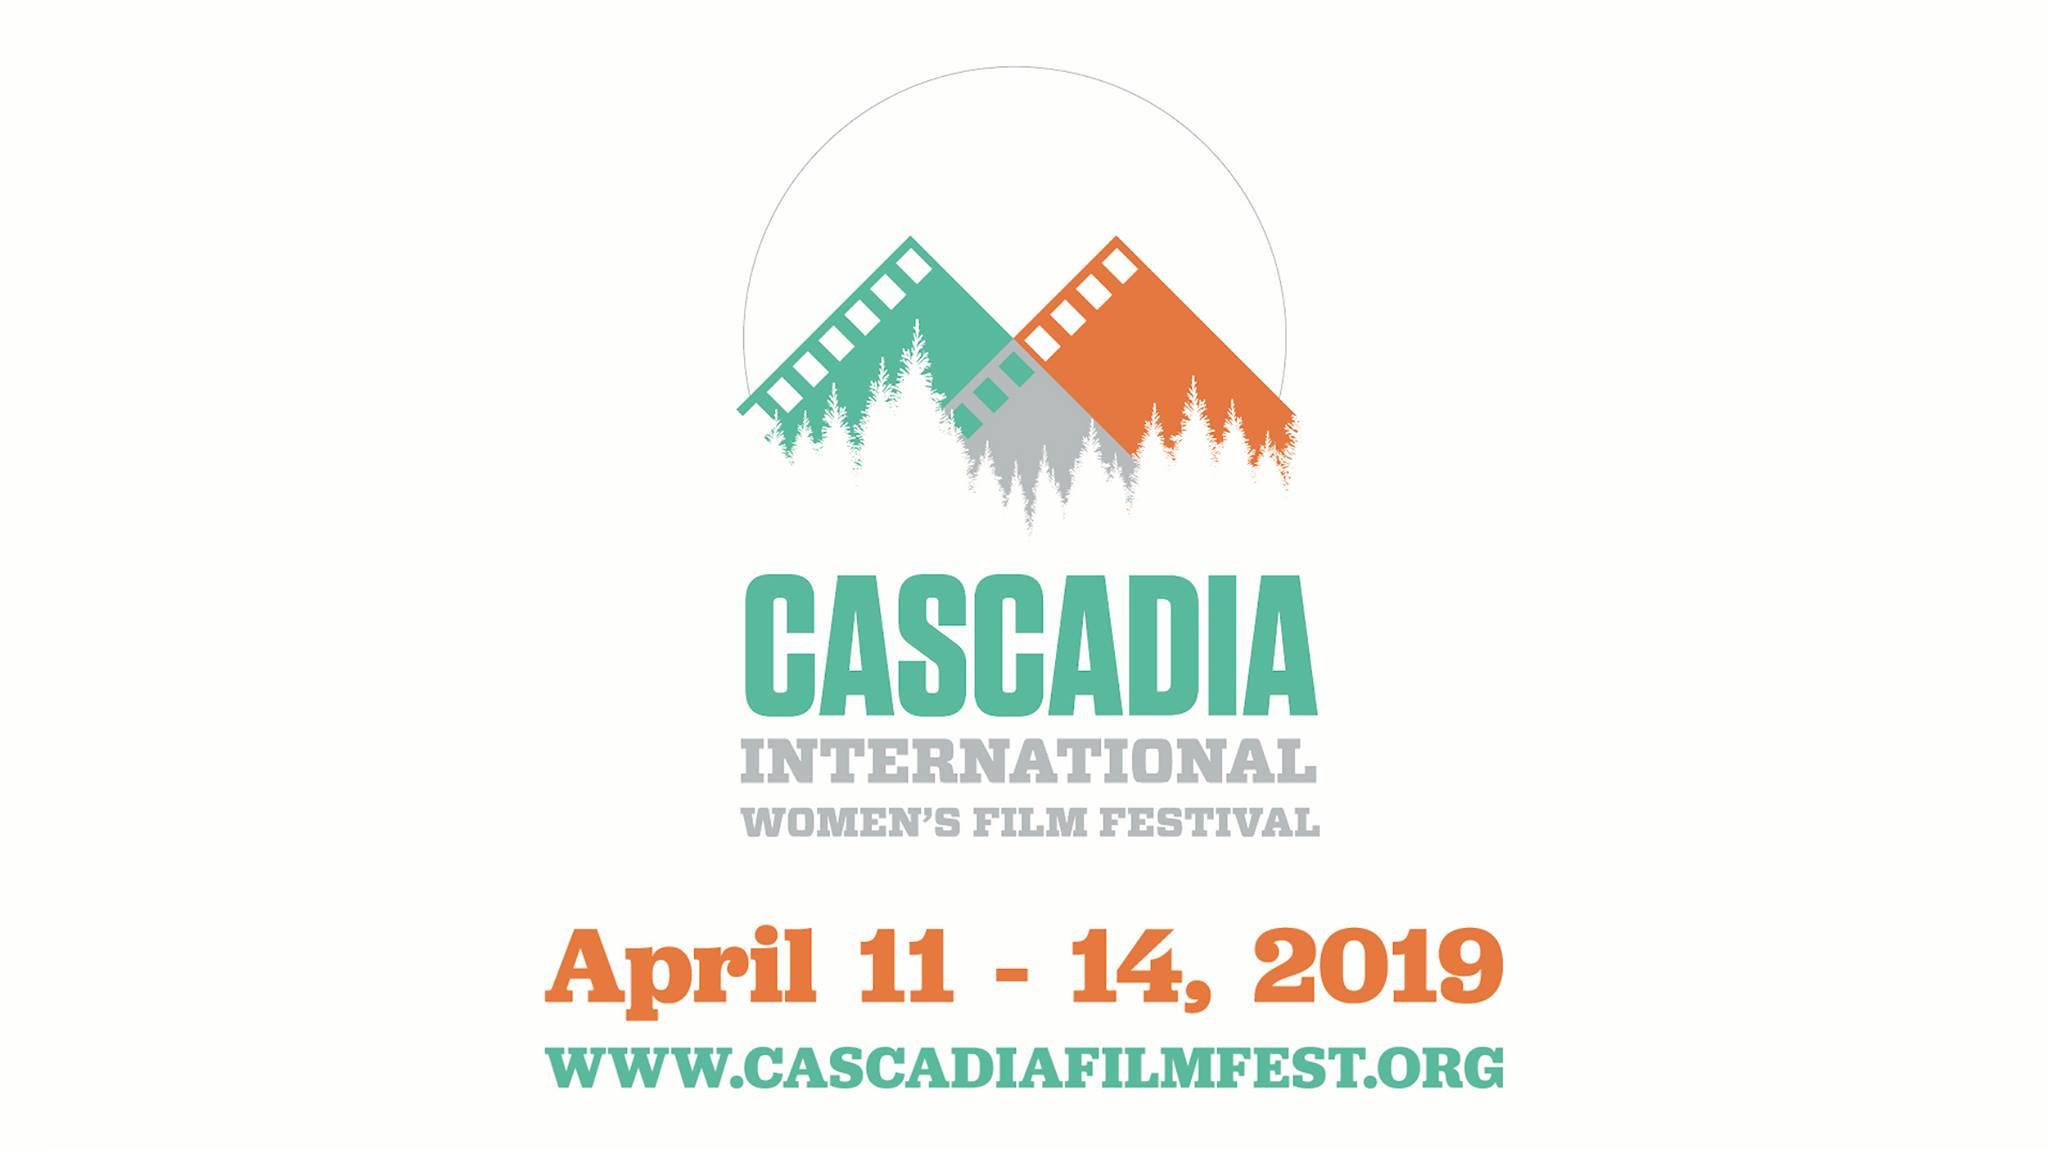 http://www.cascadiafilmfest.org/